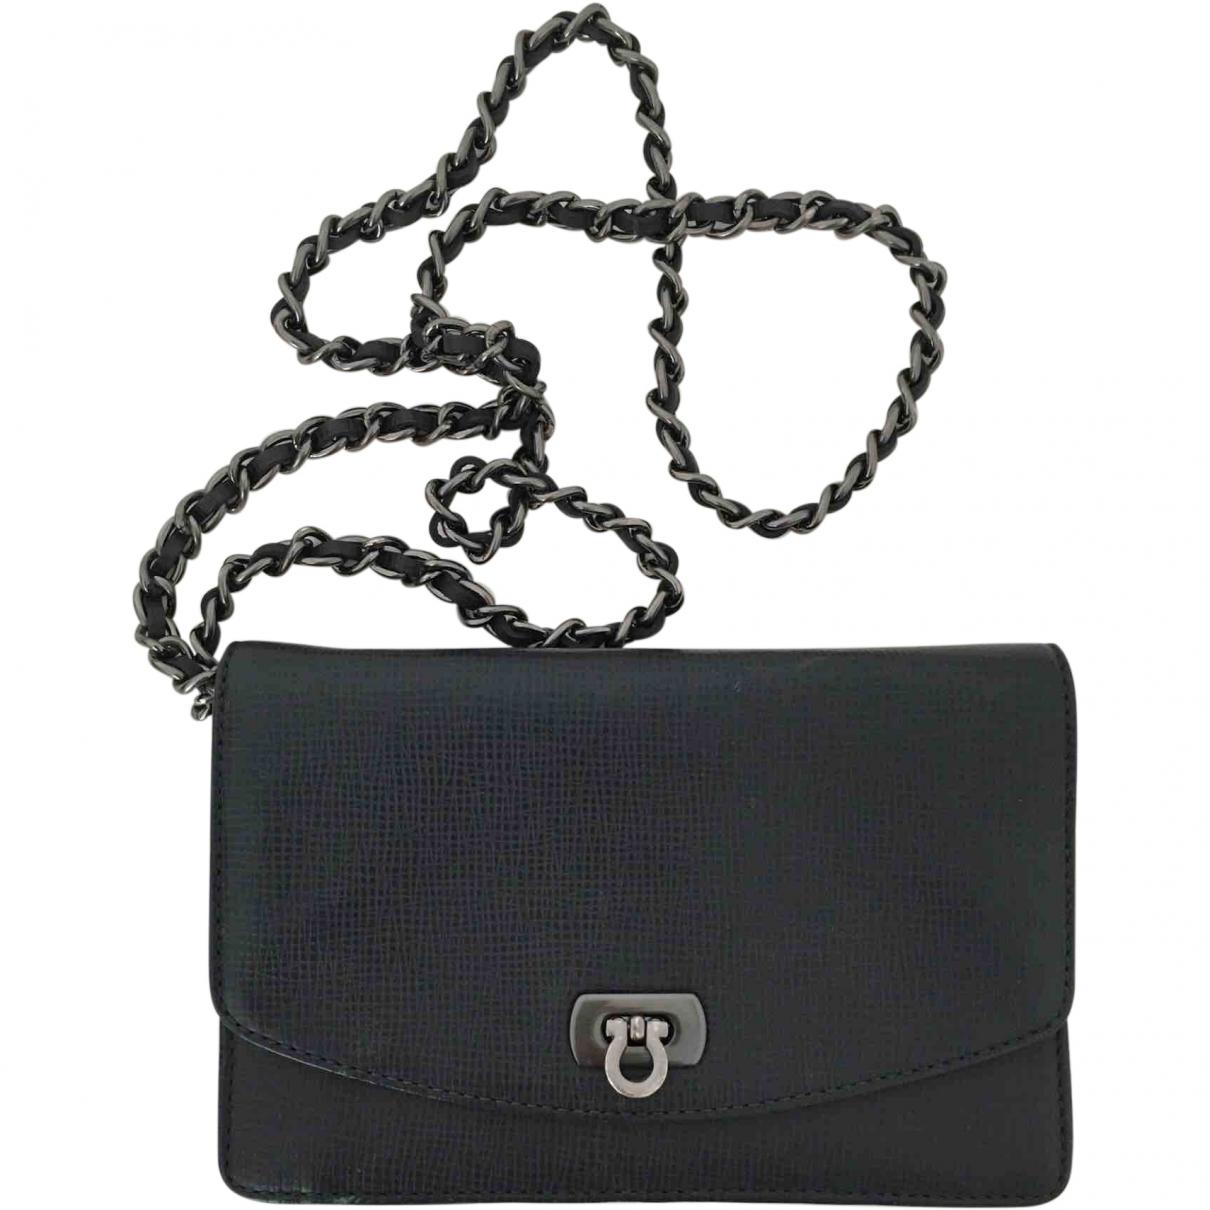 Uterque \N Navy Leather handbag for Women \N